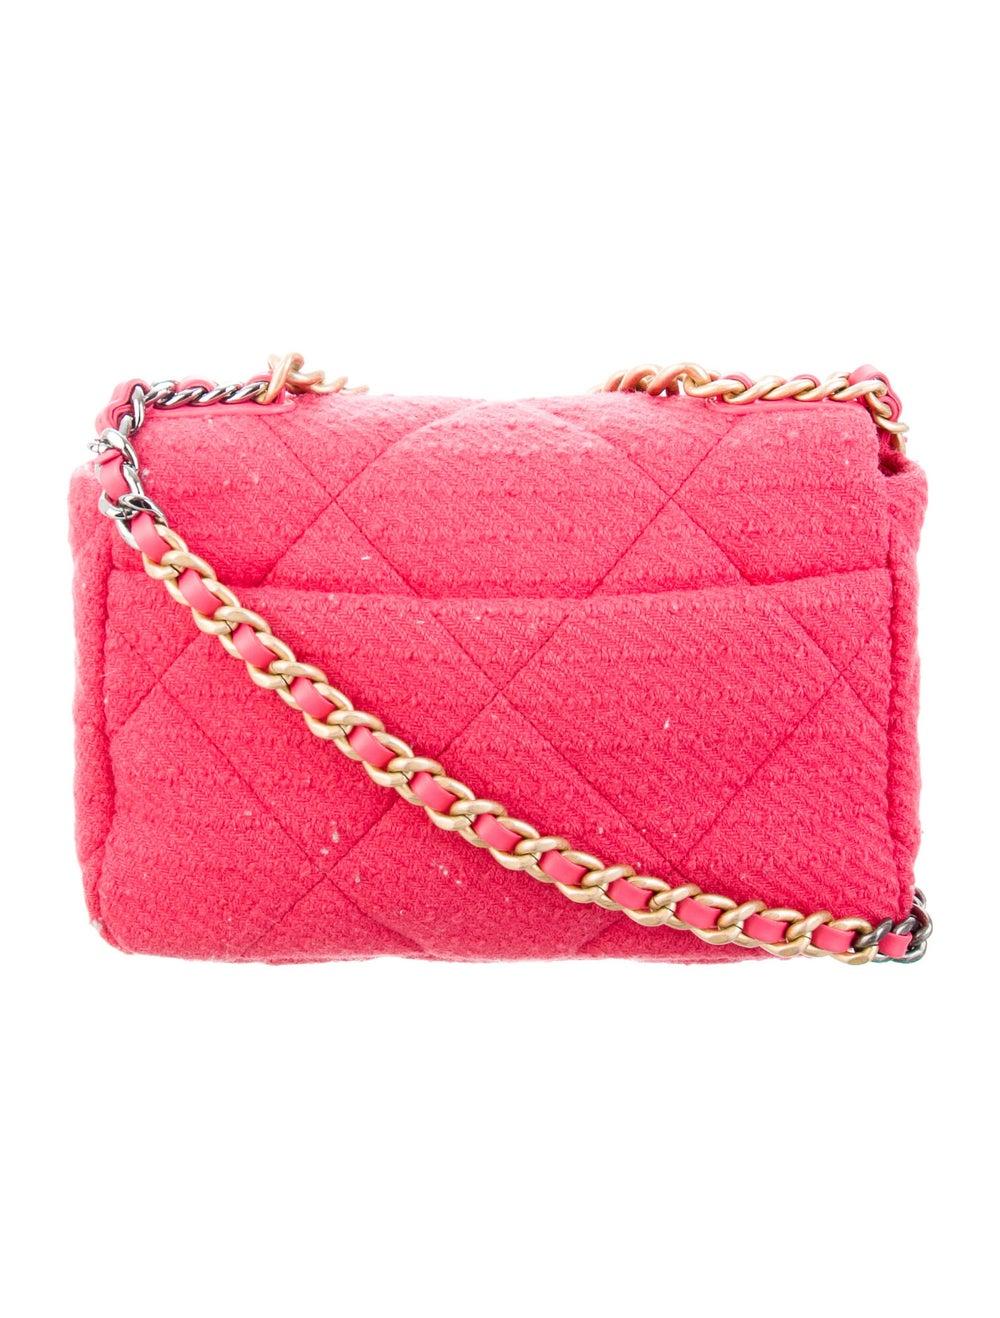 Chanel 2020 Medium Tweed 19 Bag Pink - image 4